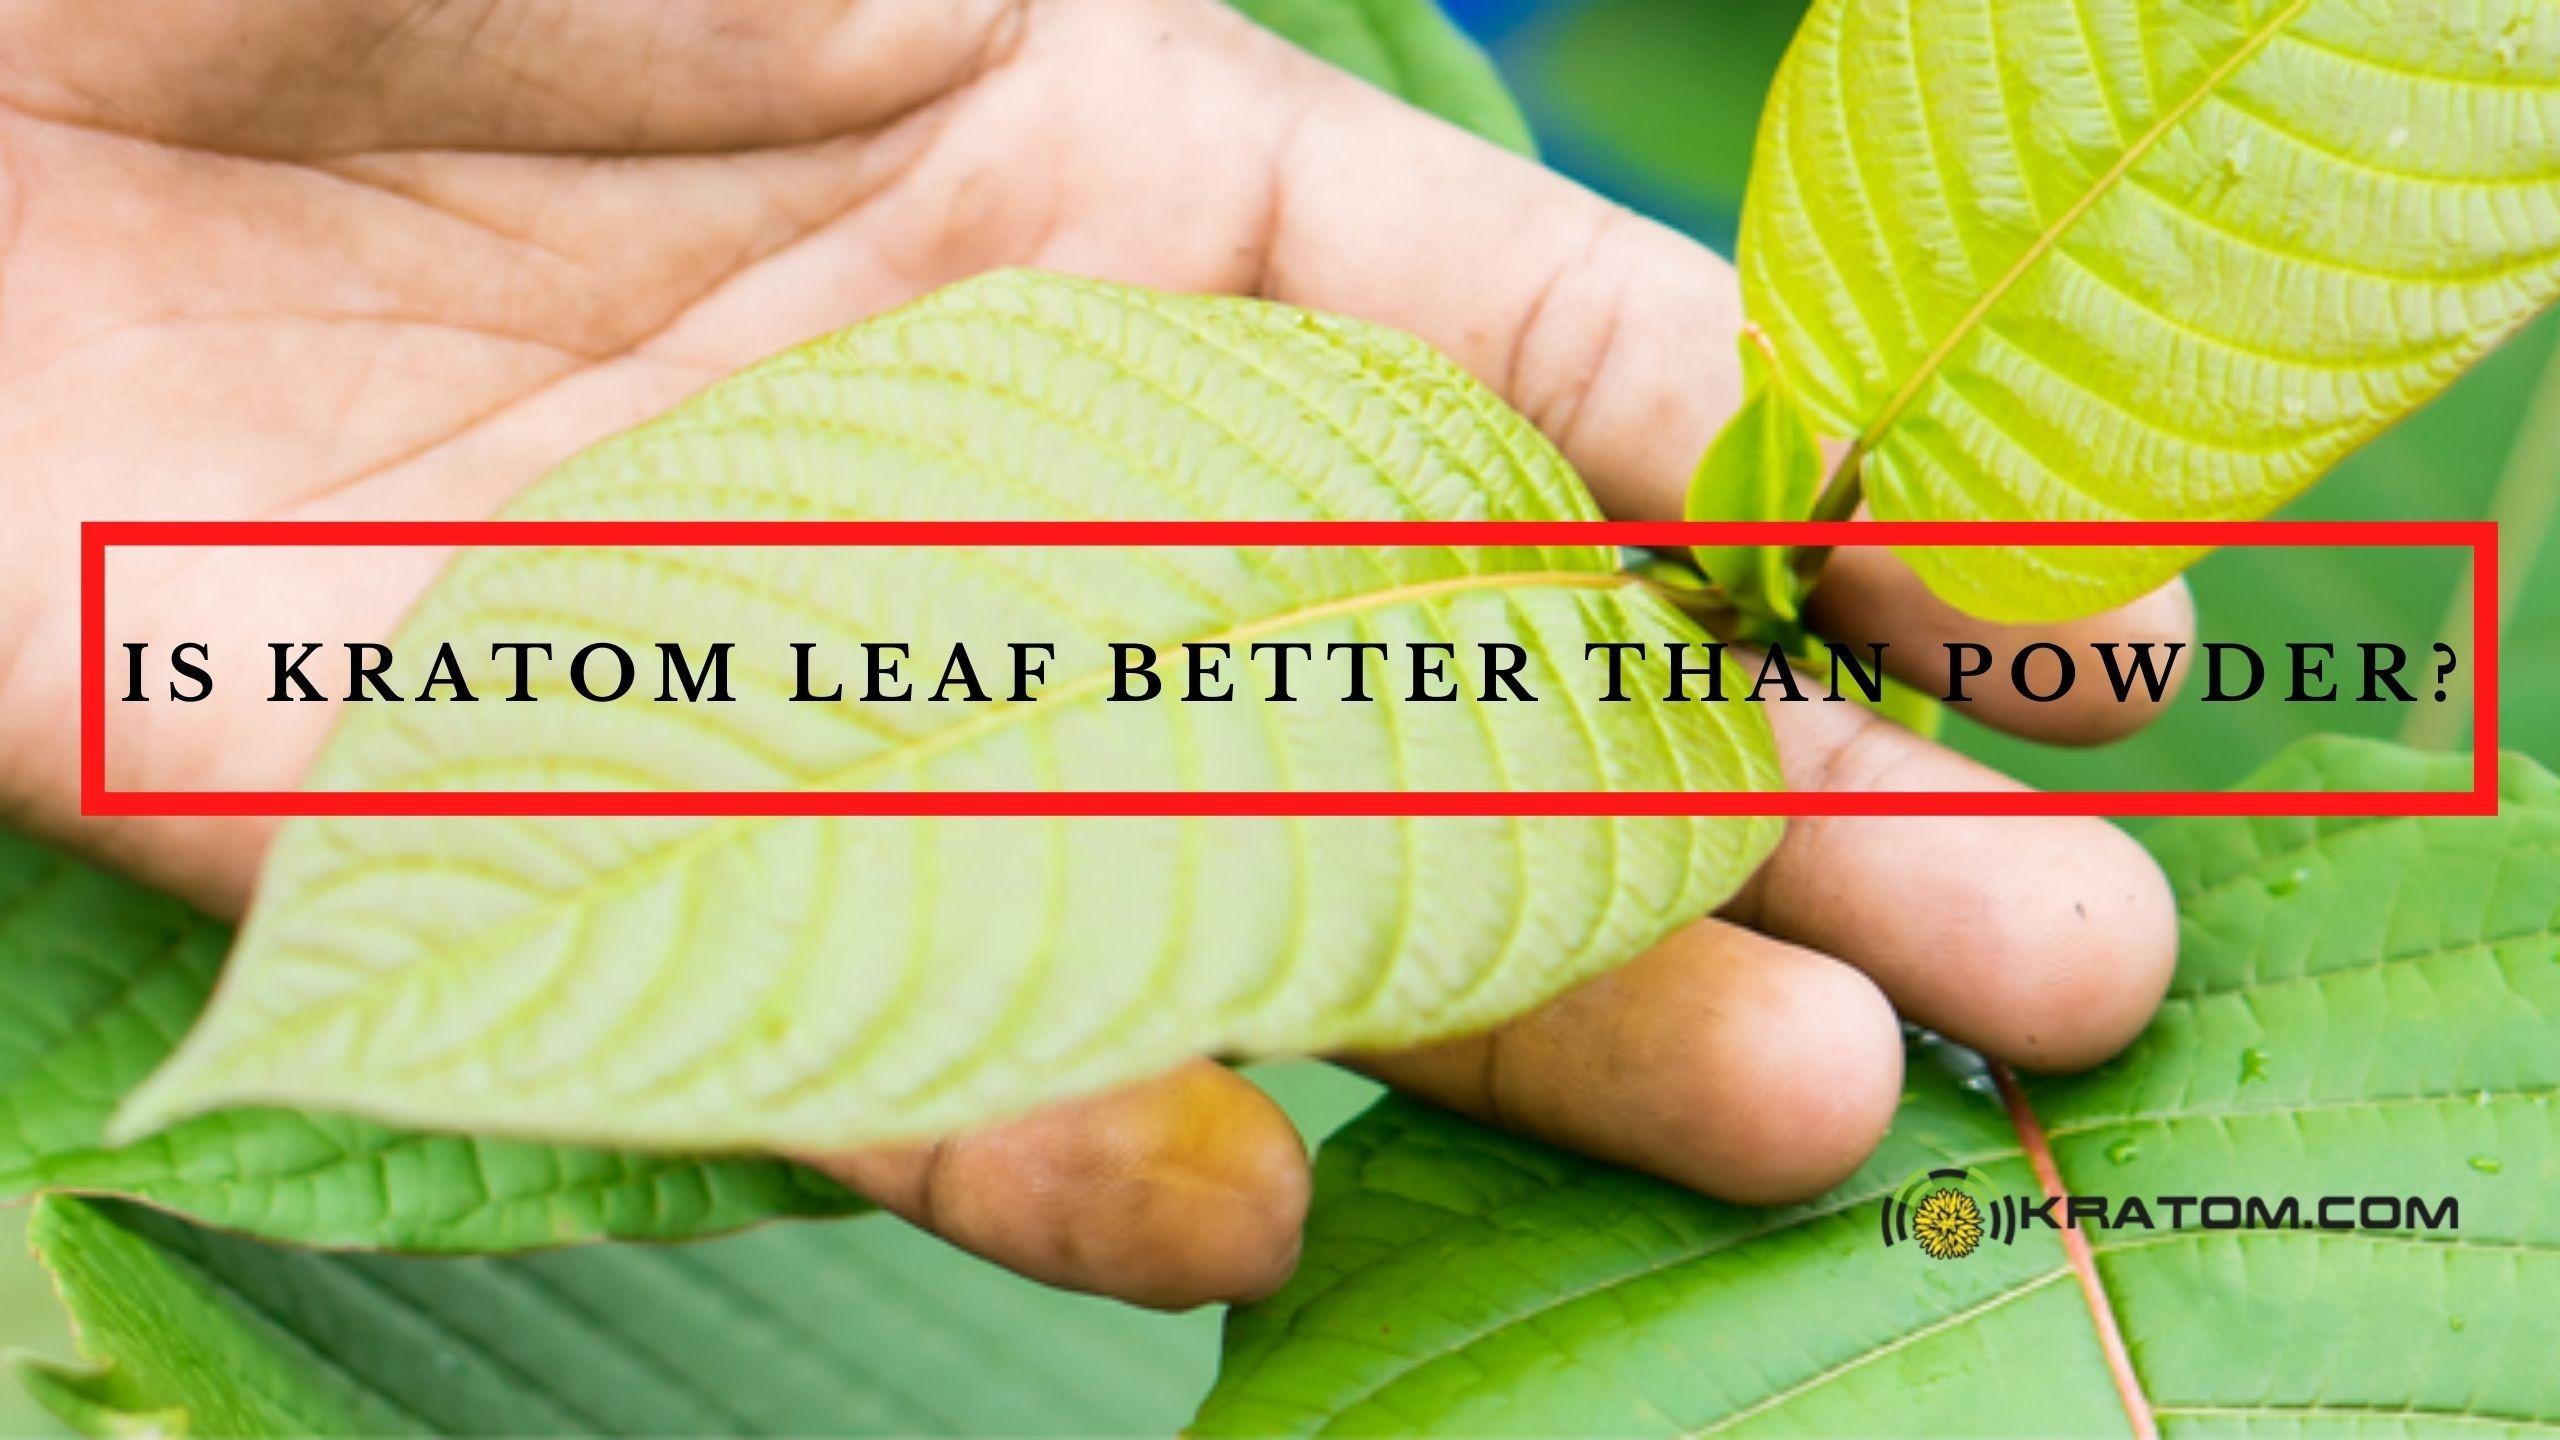 Is Kratom Leaf Better Than Powder?